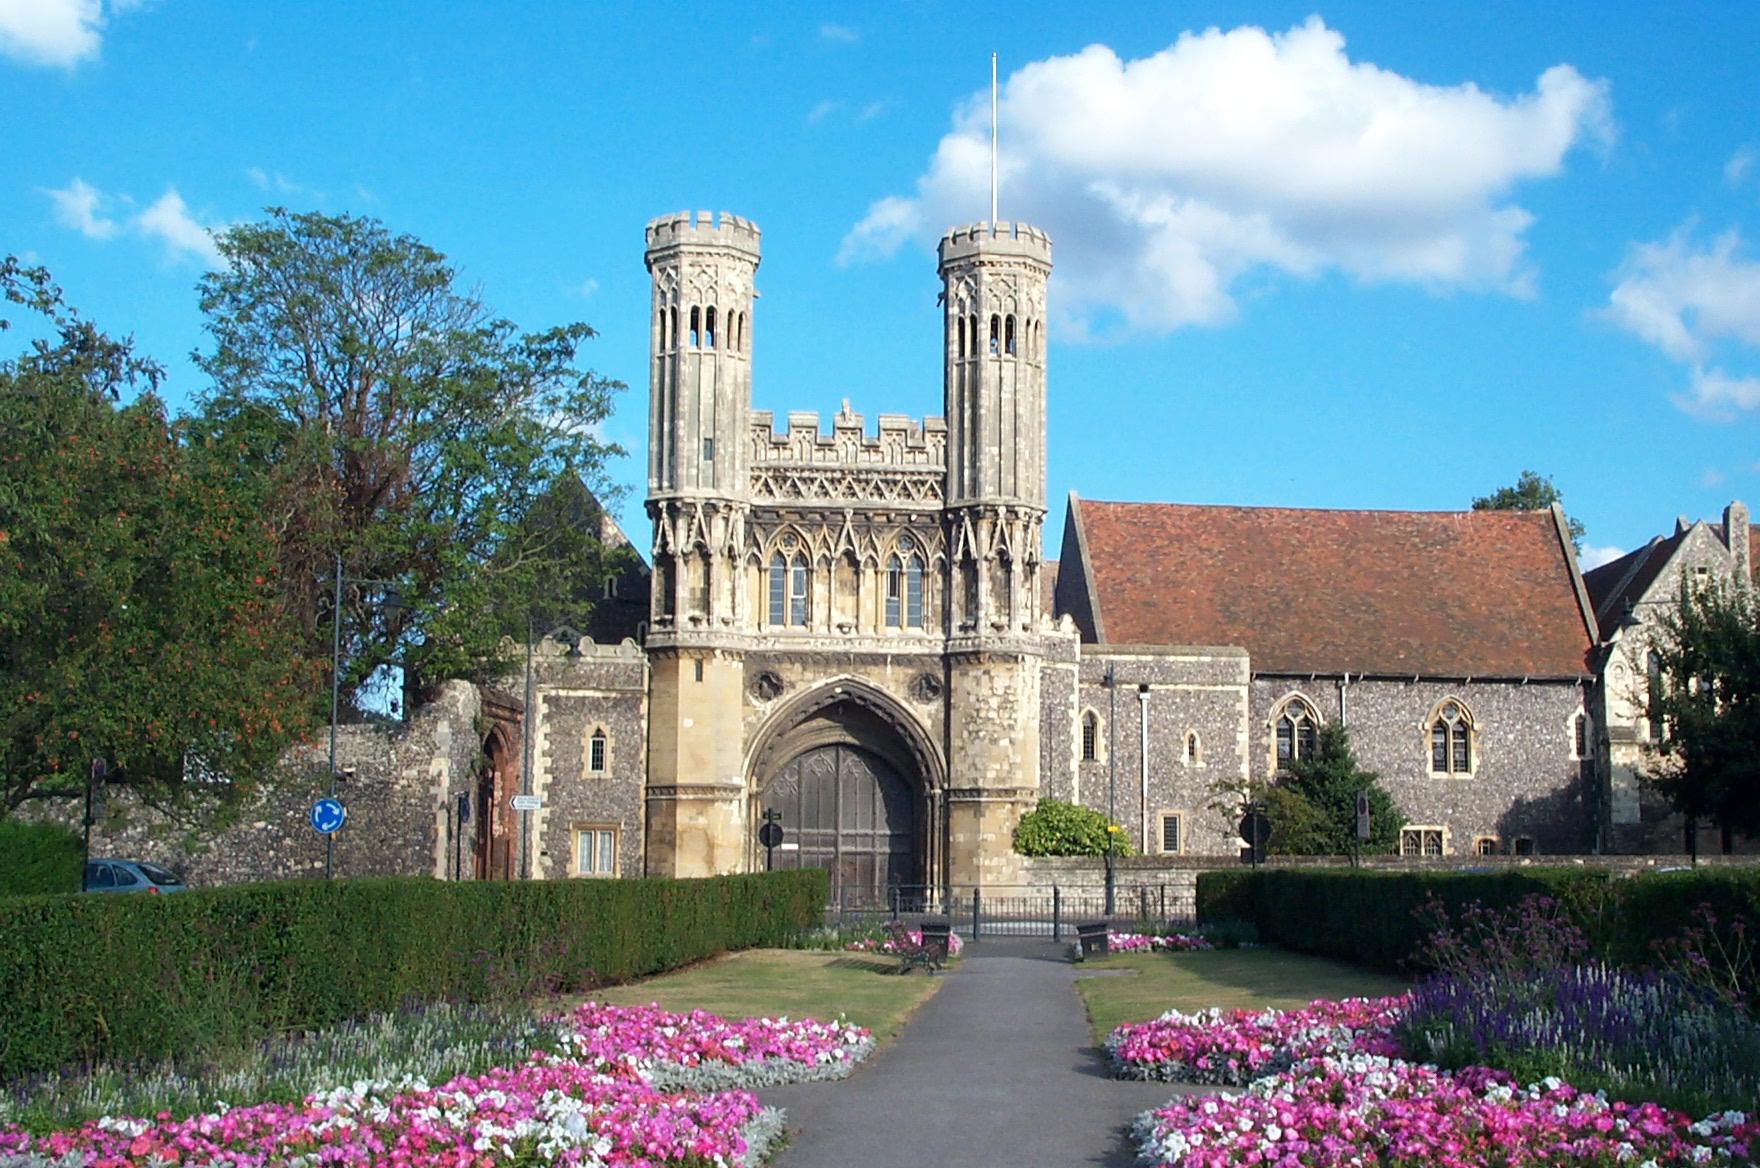 http://upload.wikimedia.org/wikipedia/commons/6/60/Augustine_Abbey.jpg?uselang=ru